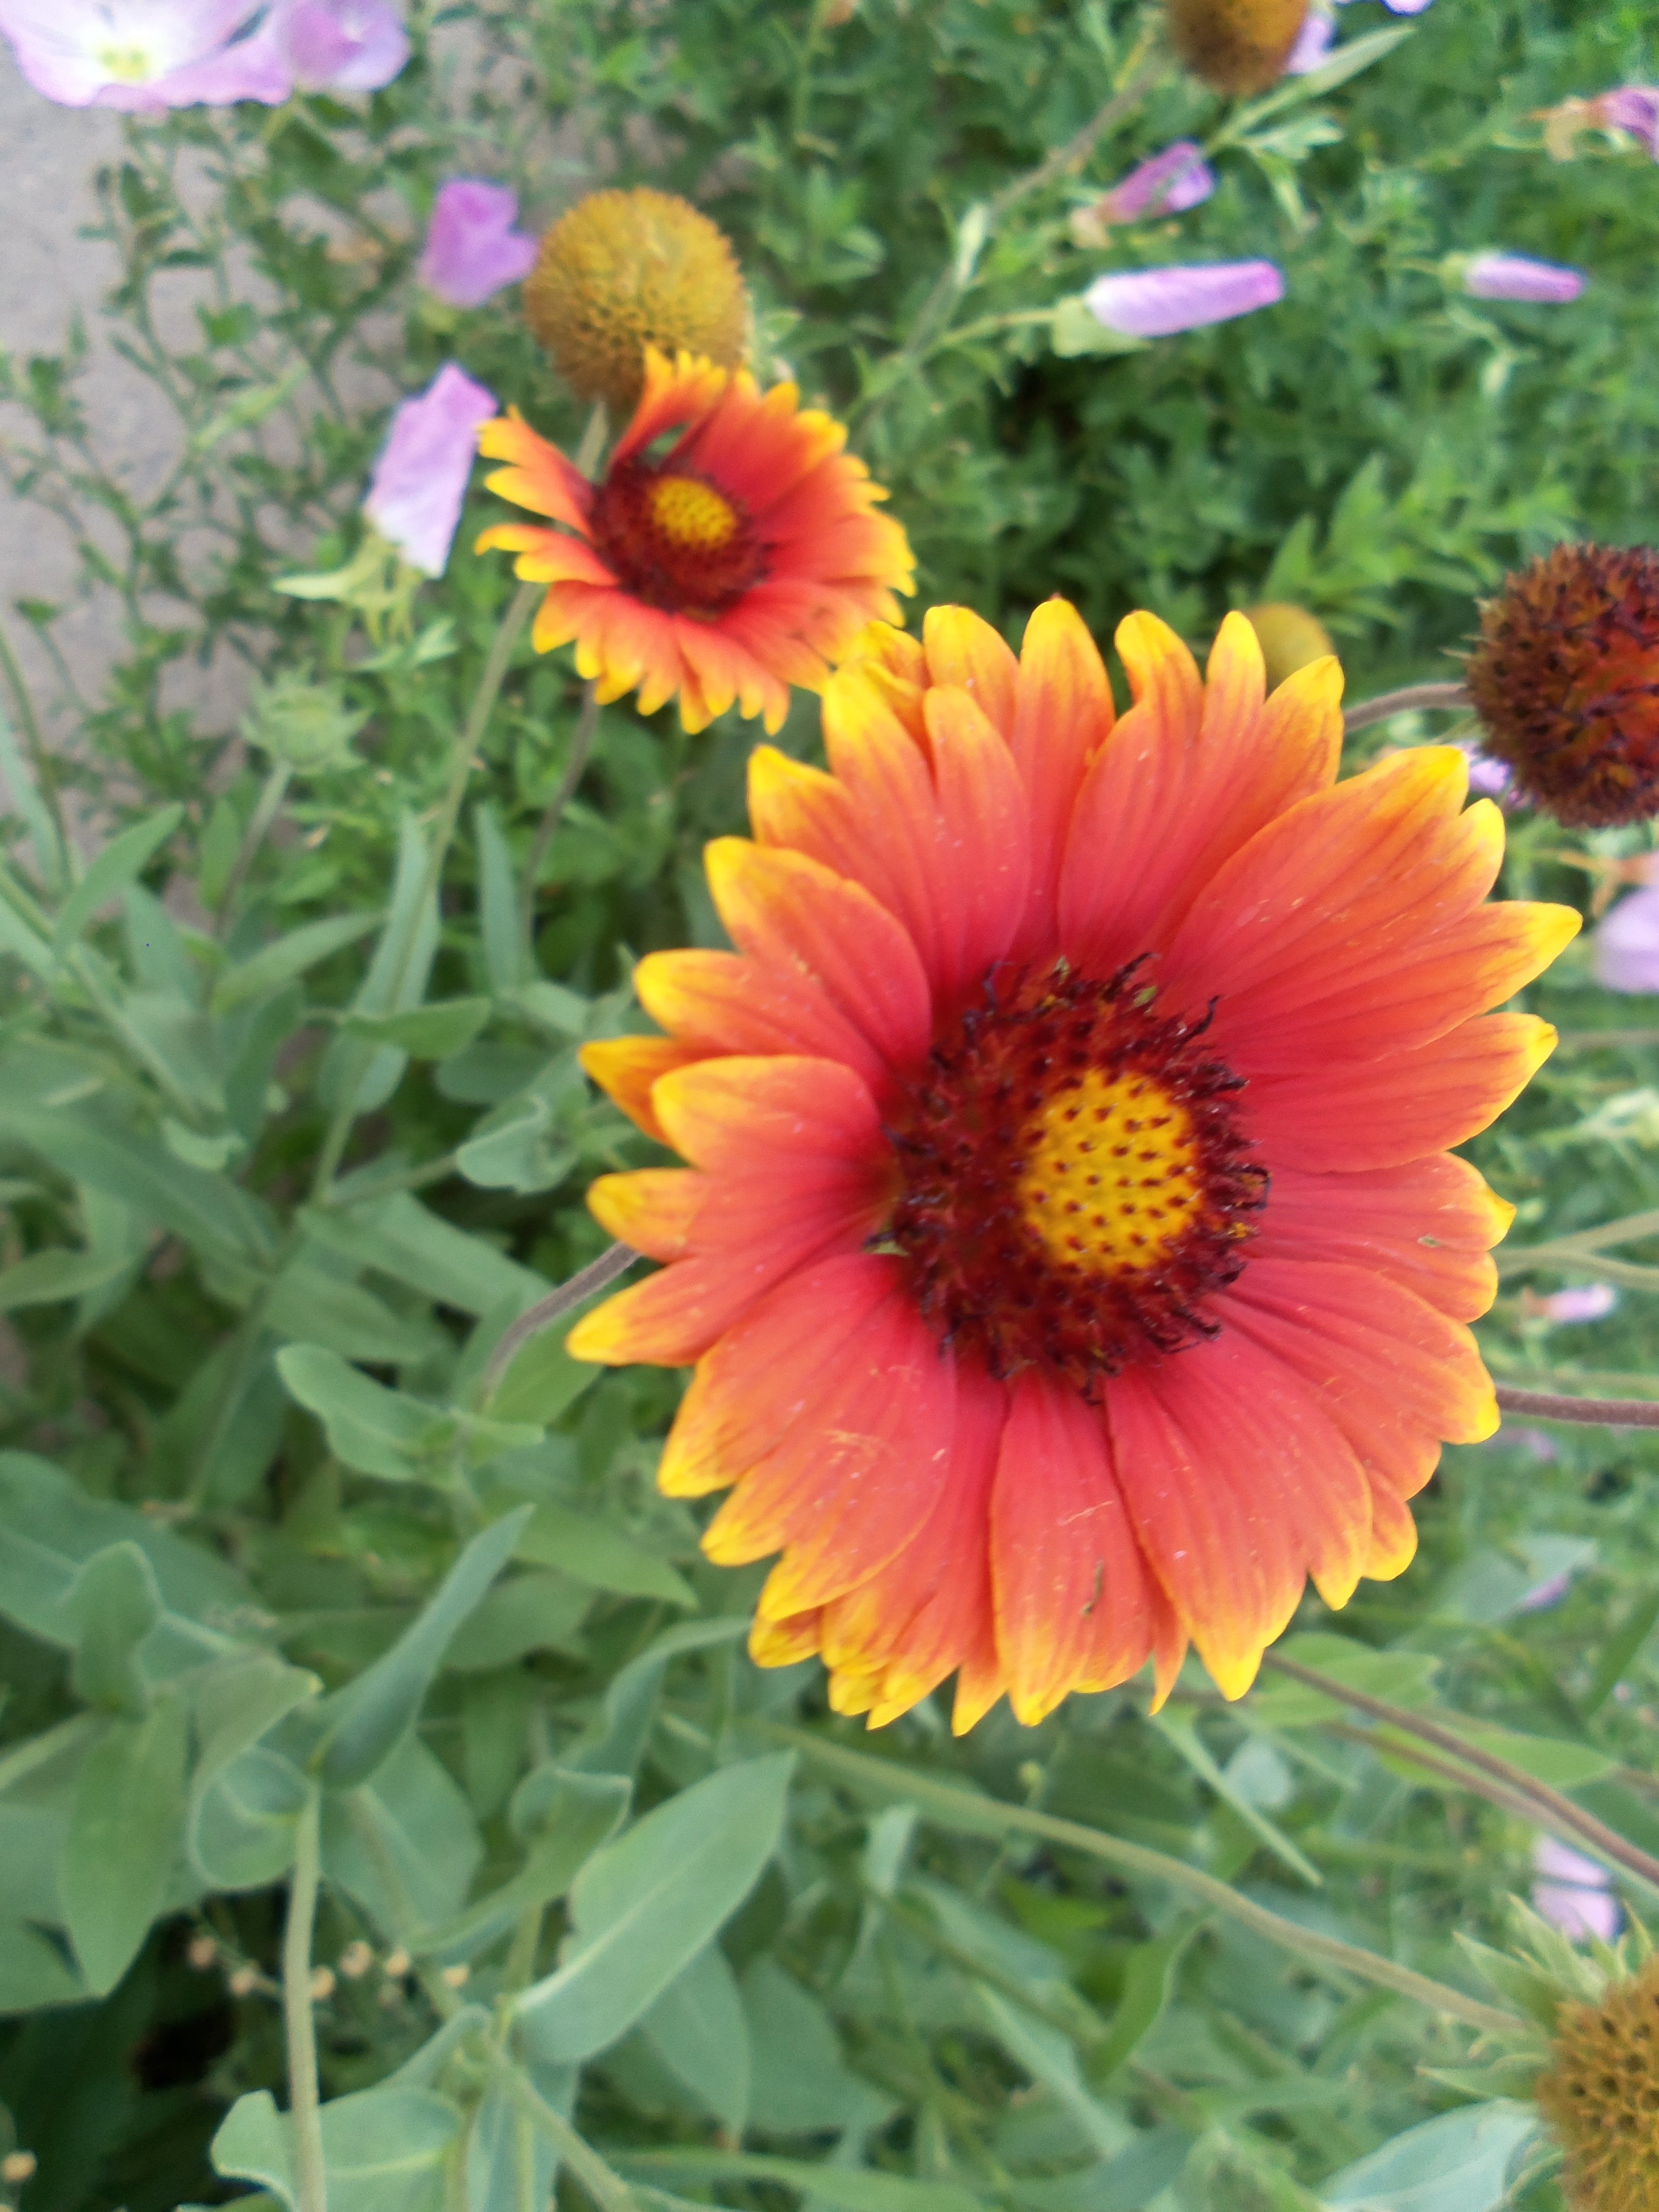 Indian Paint Brush Or Fire Wheel Flowers Nature Plants Watercolor Splash Flowers